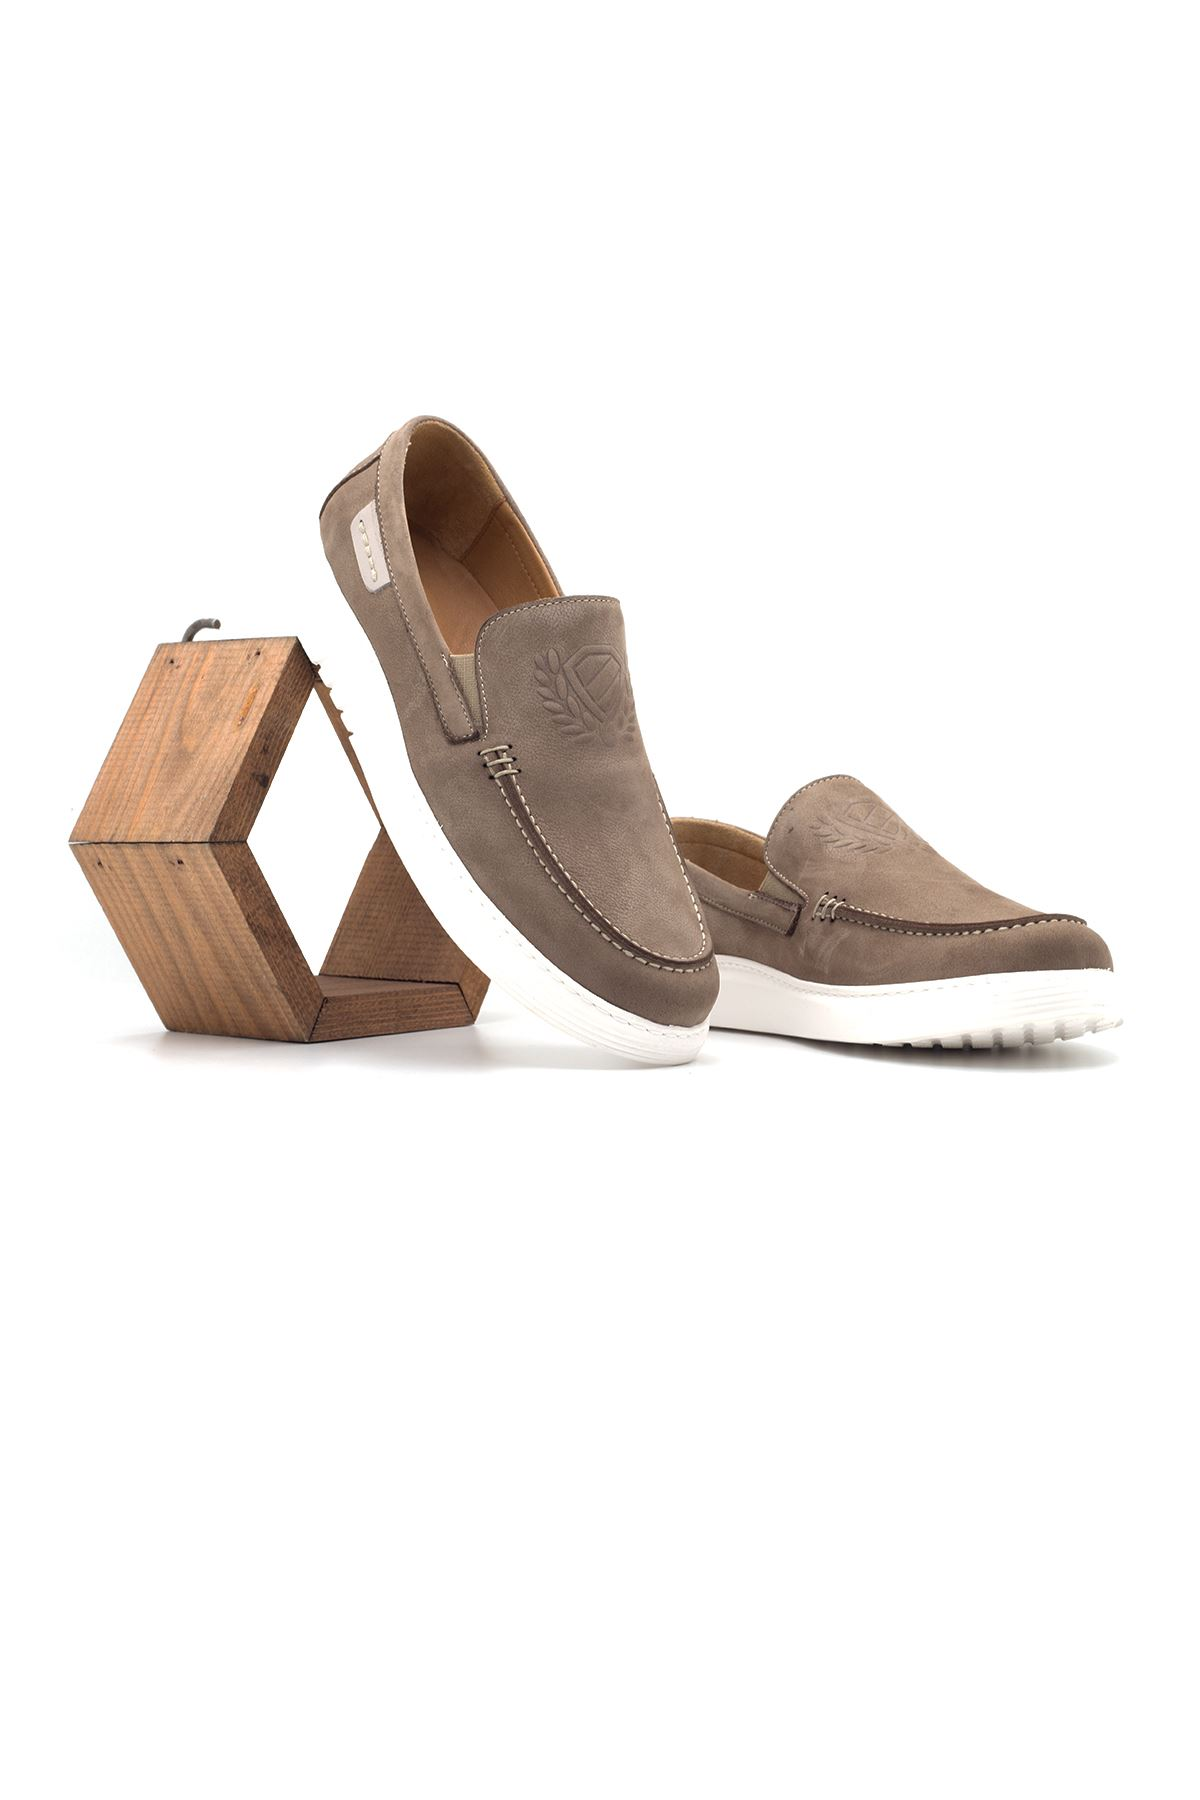 2105 Nubuk Kum Stil Erkek Ayakkabı